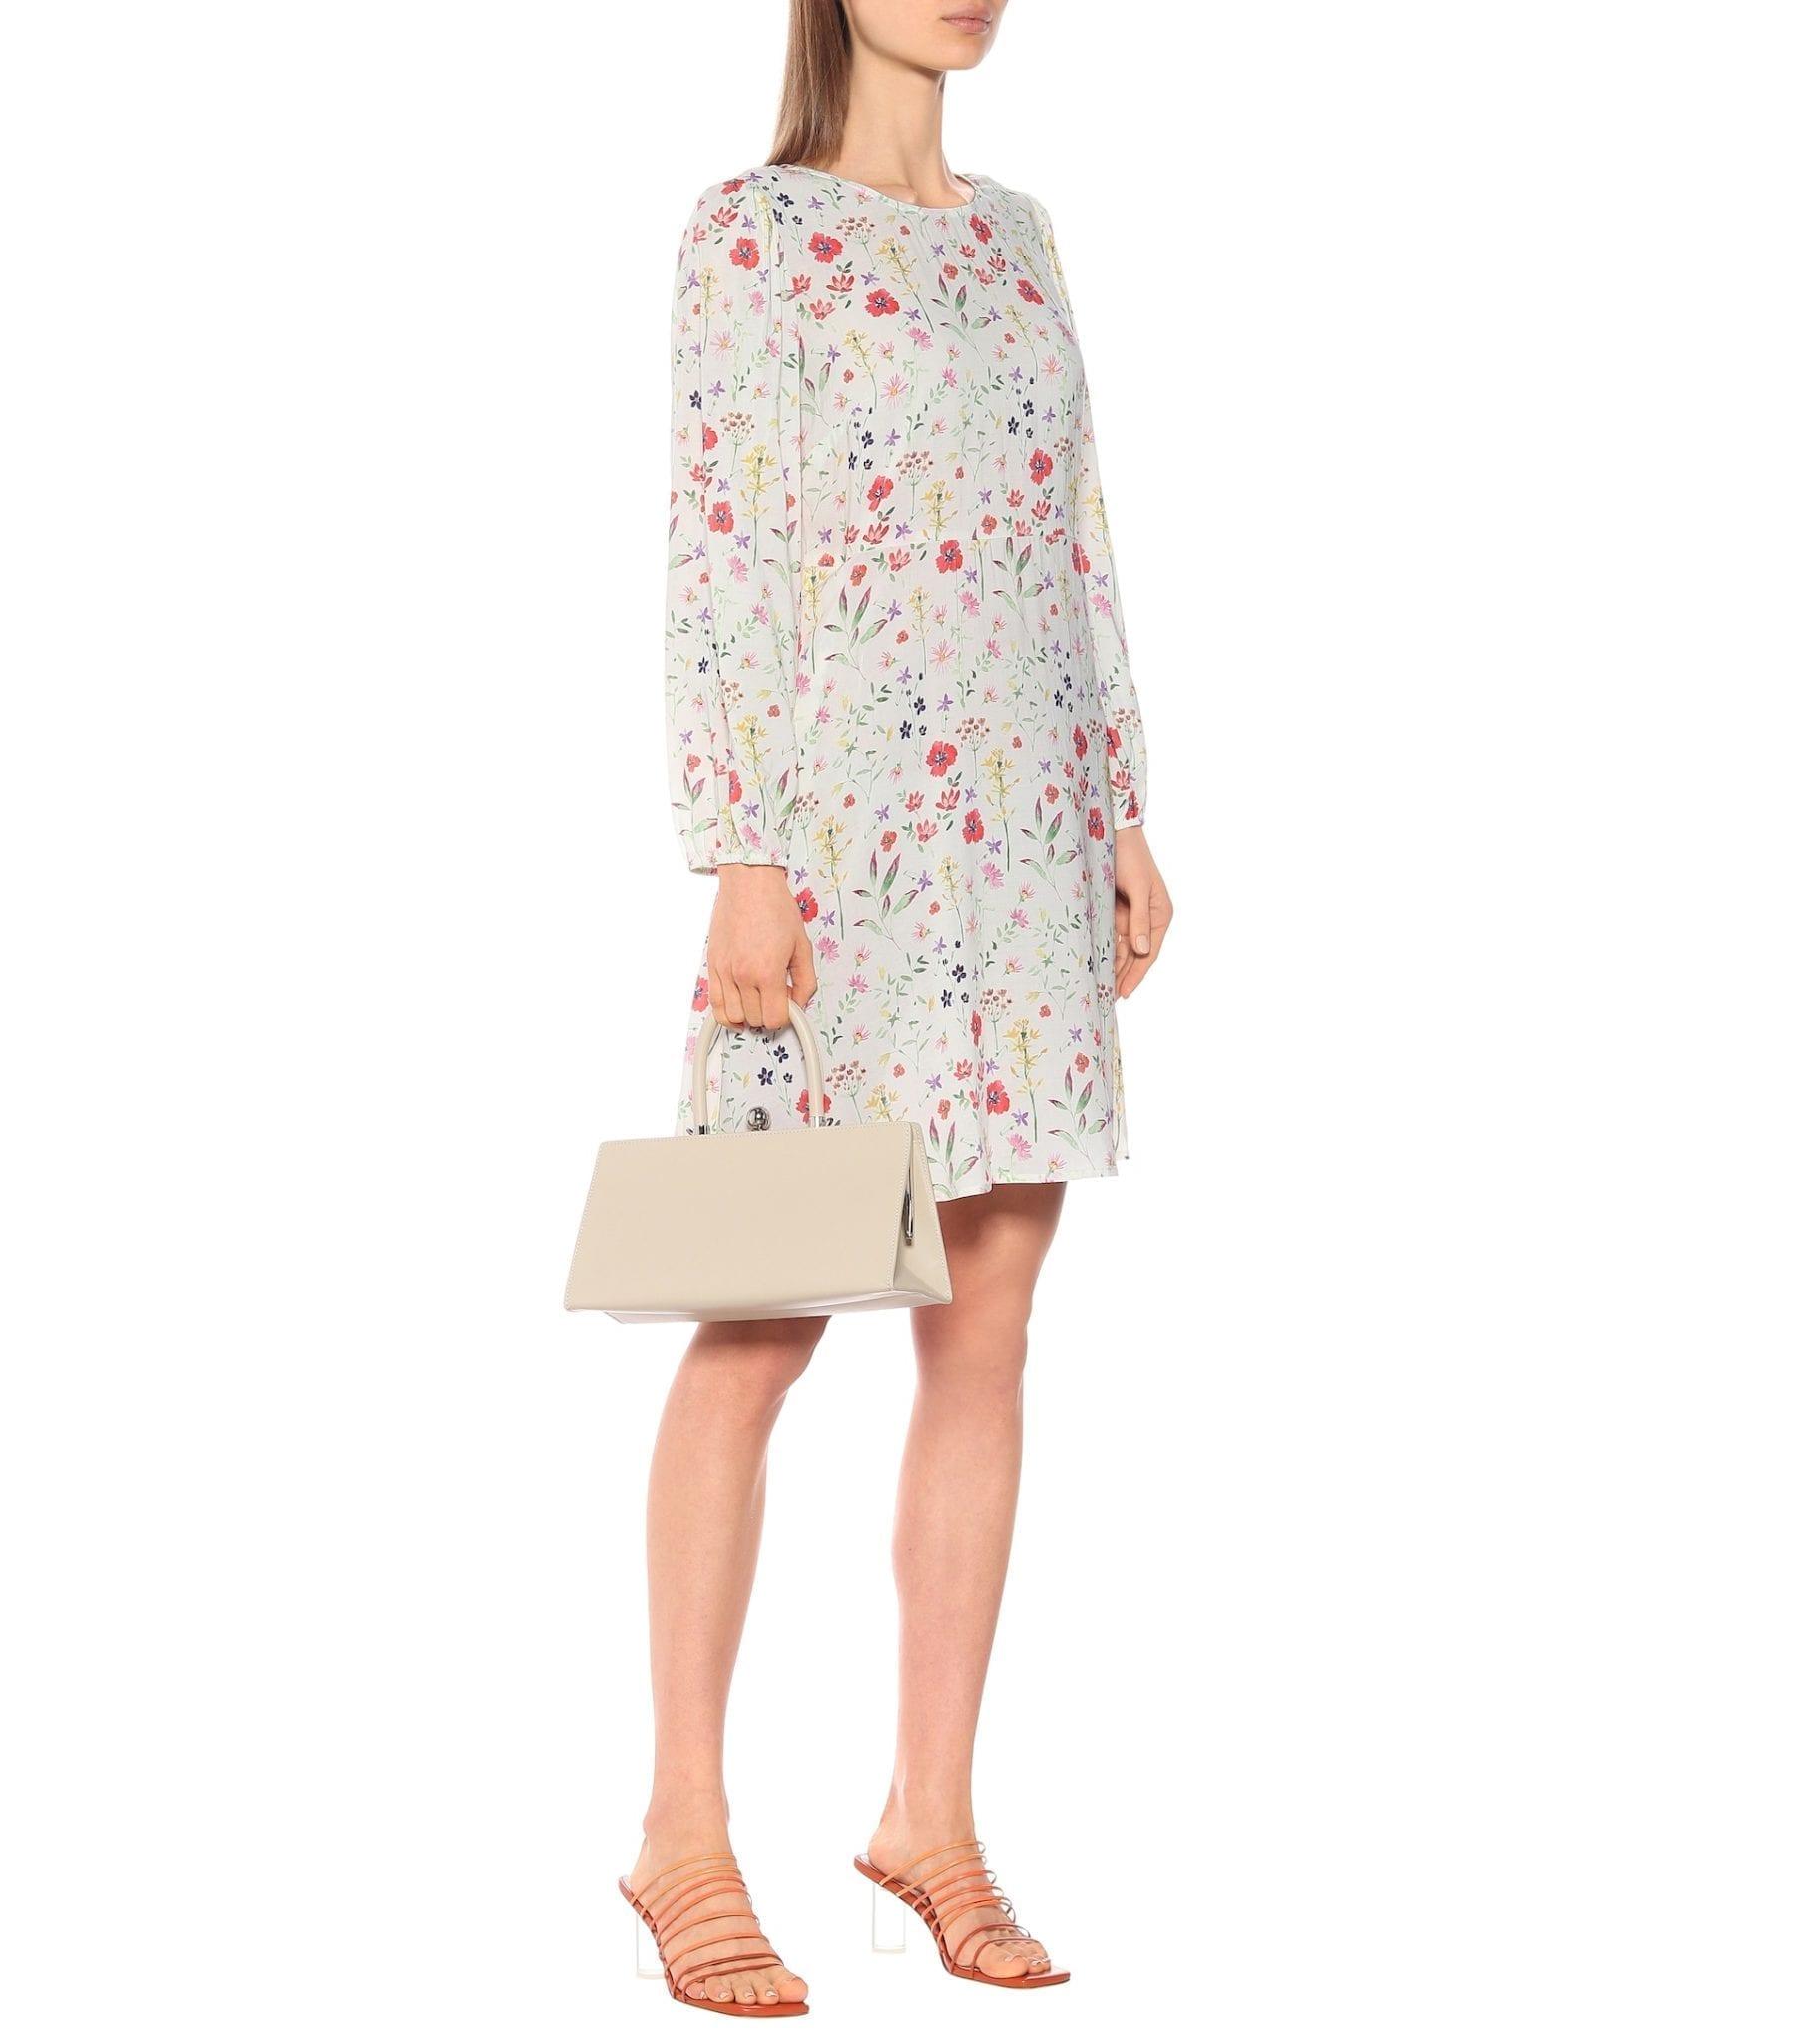 VELVET Exclusive To Mytheresa – Wiinny Floral Mini Dress